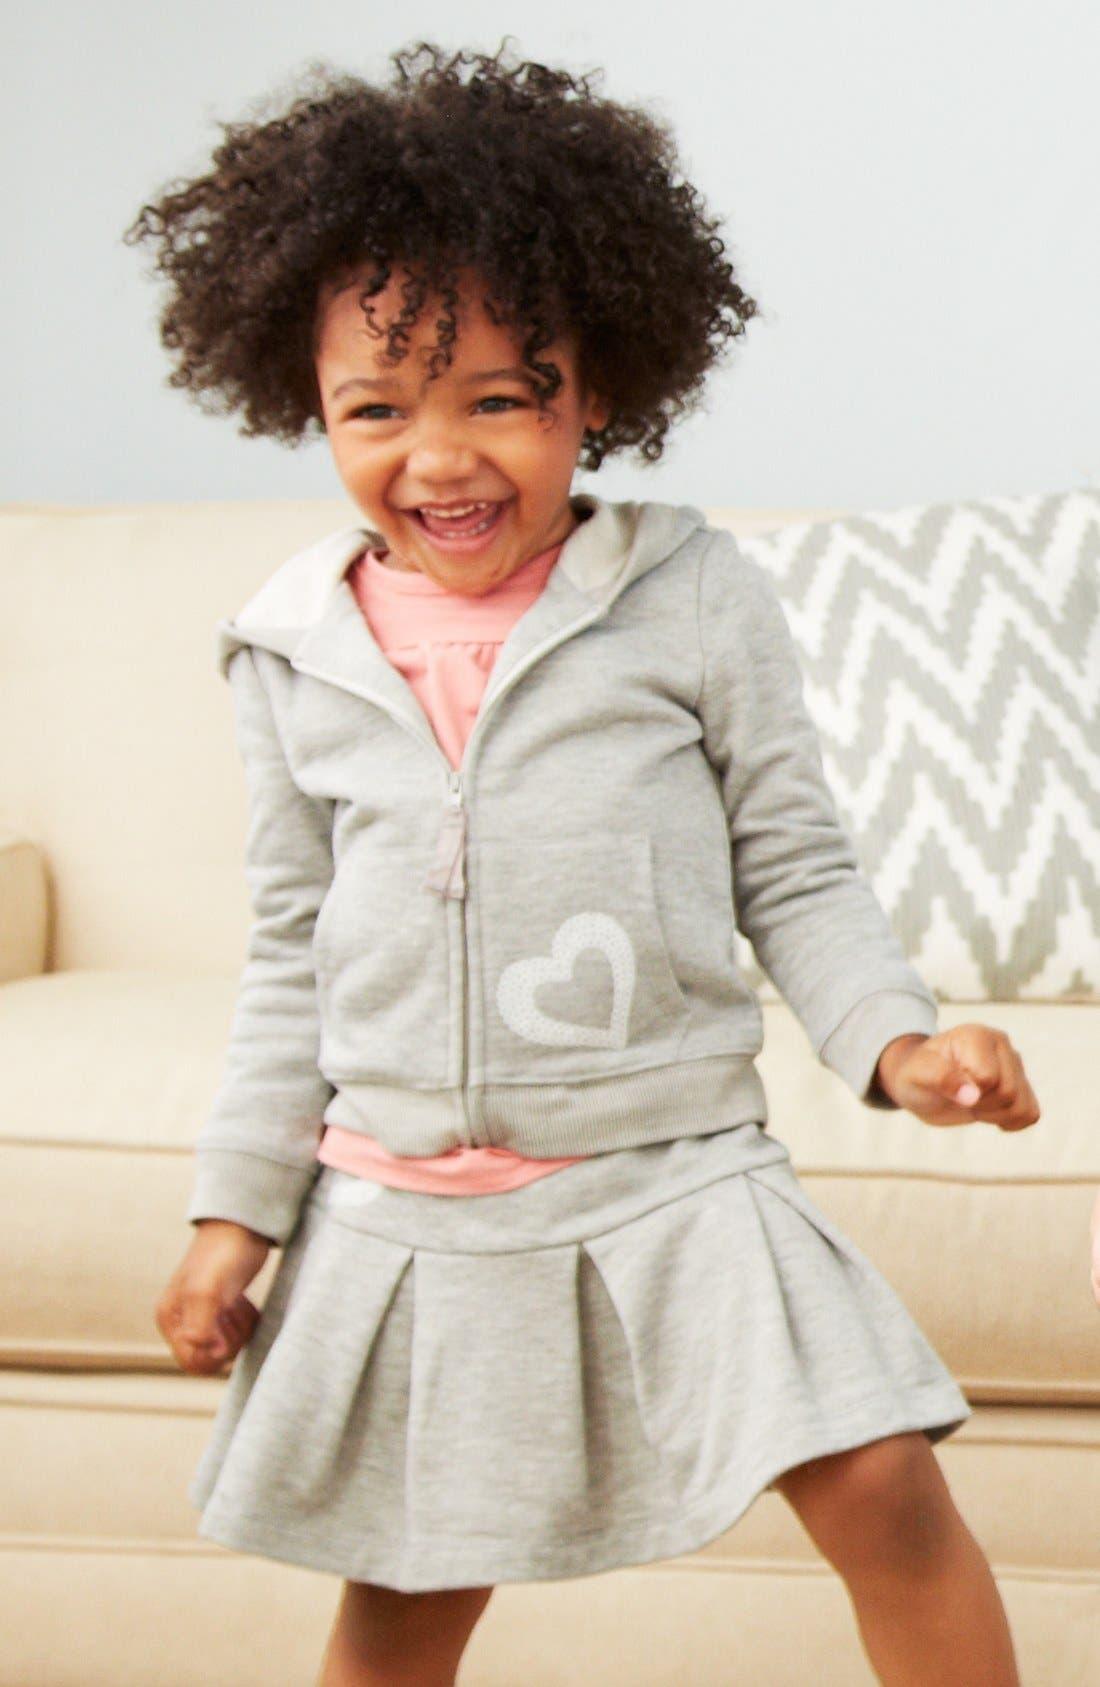 Alternate Image 1 Selected - Design History Hoodie & Skirt, Tucker + Tate Top (Toddler Girls)